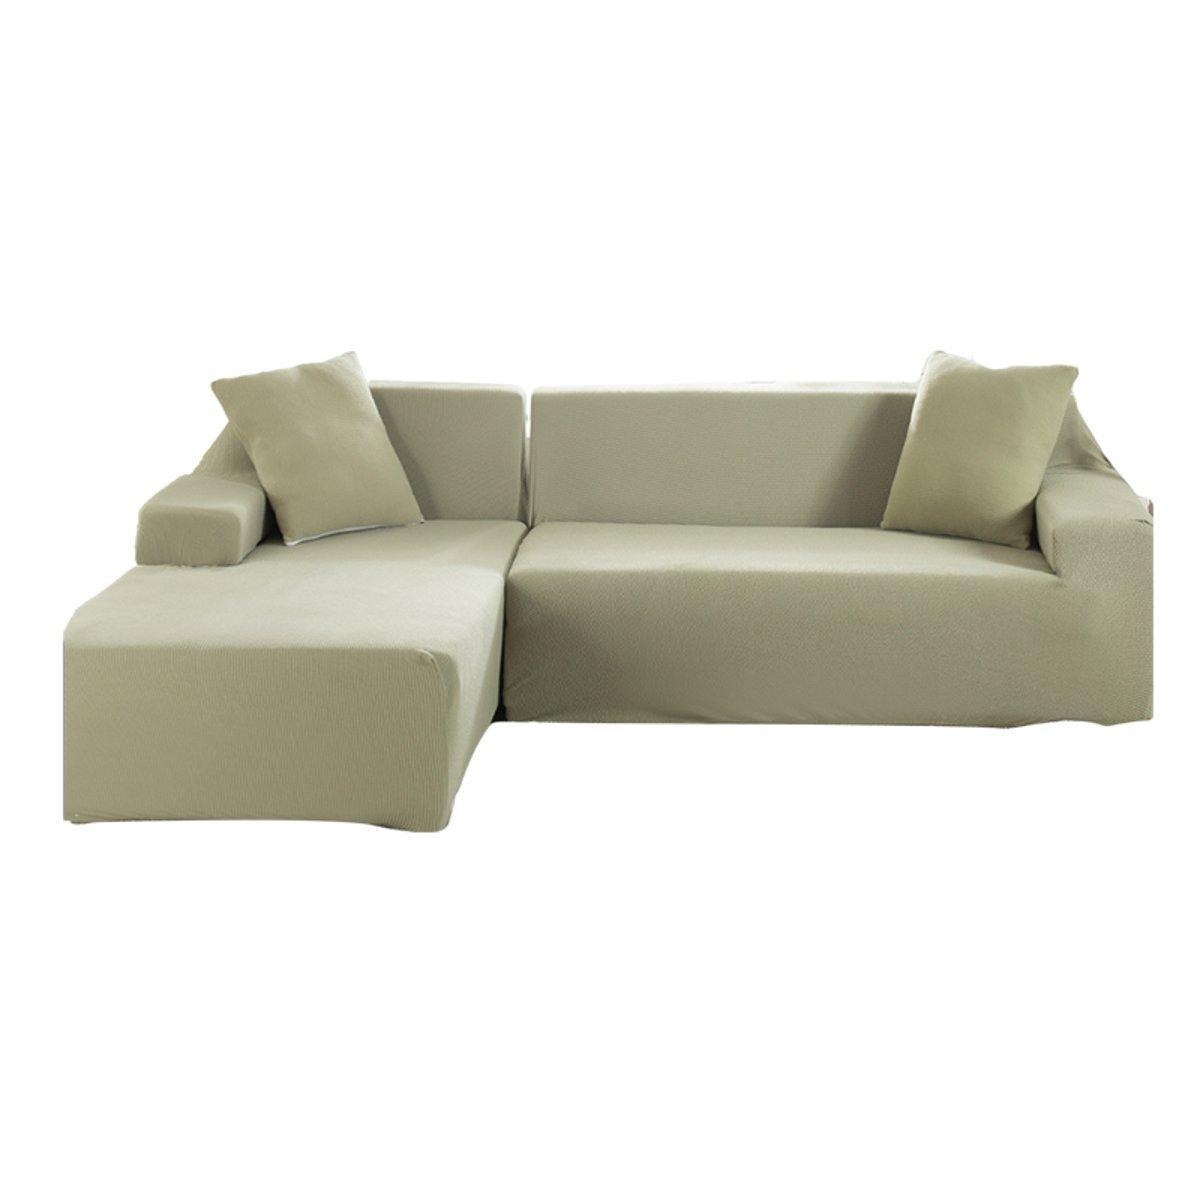 Stretch Elastic Fabric Sofa Covers